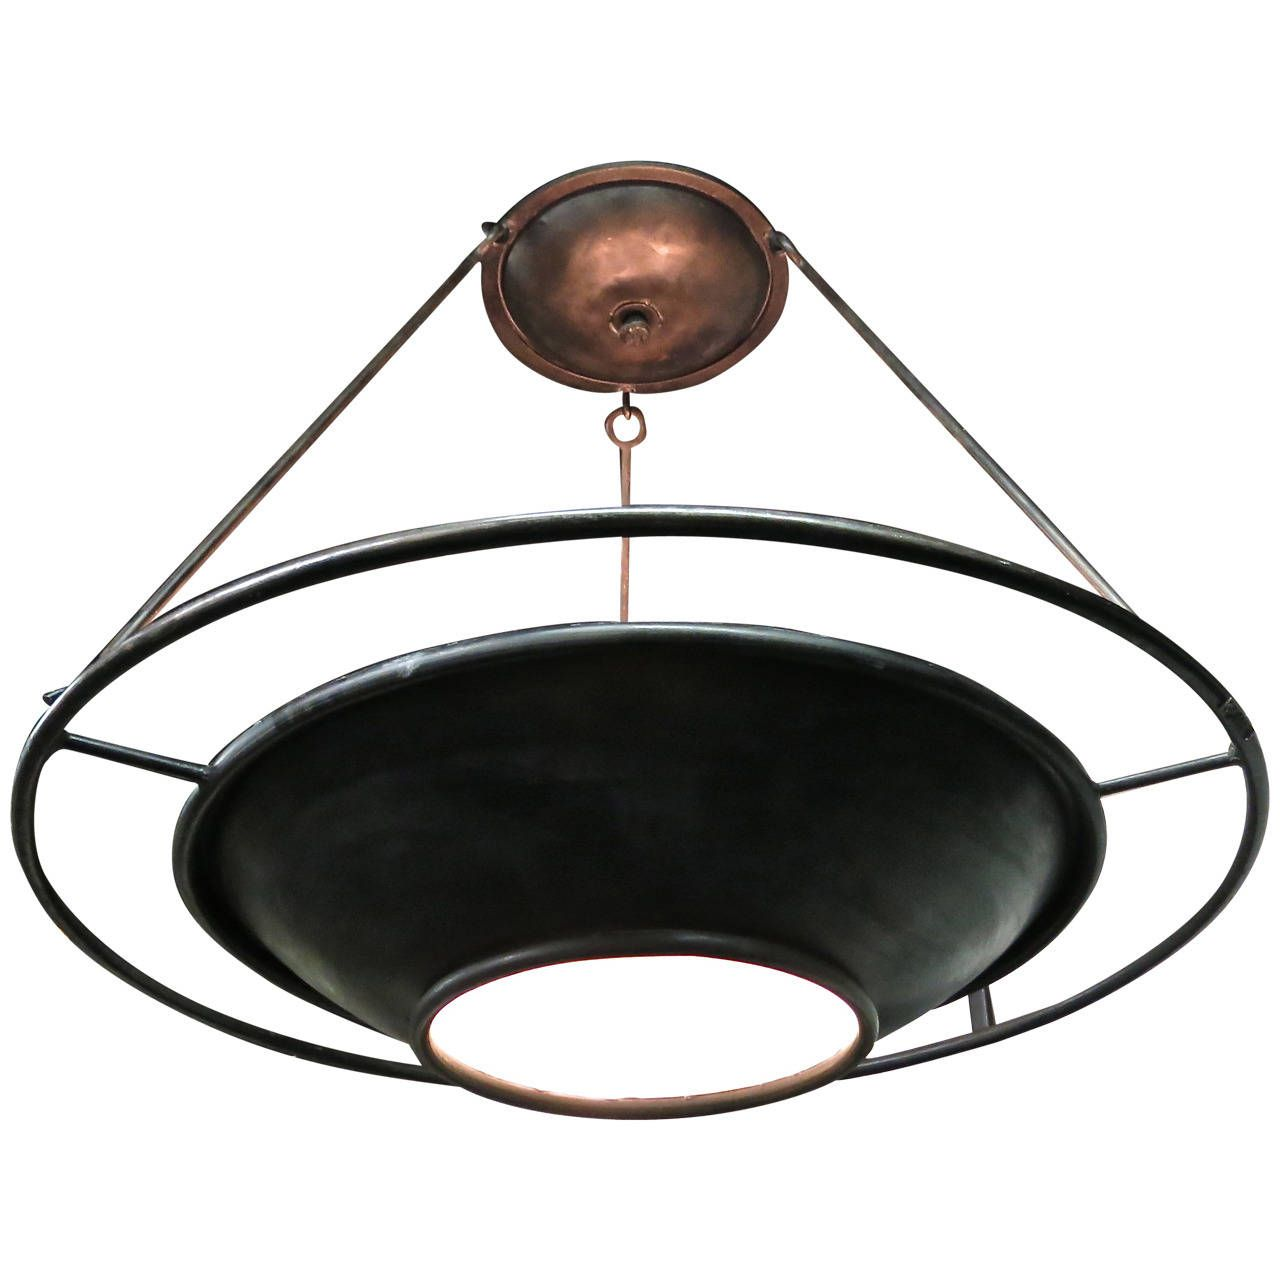 Ceiling Fixture Signed Ilana Goor Circa 1990 Made In Usa Ceiling Fixtures Chandelier Pendant Lights Vintage Lighting